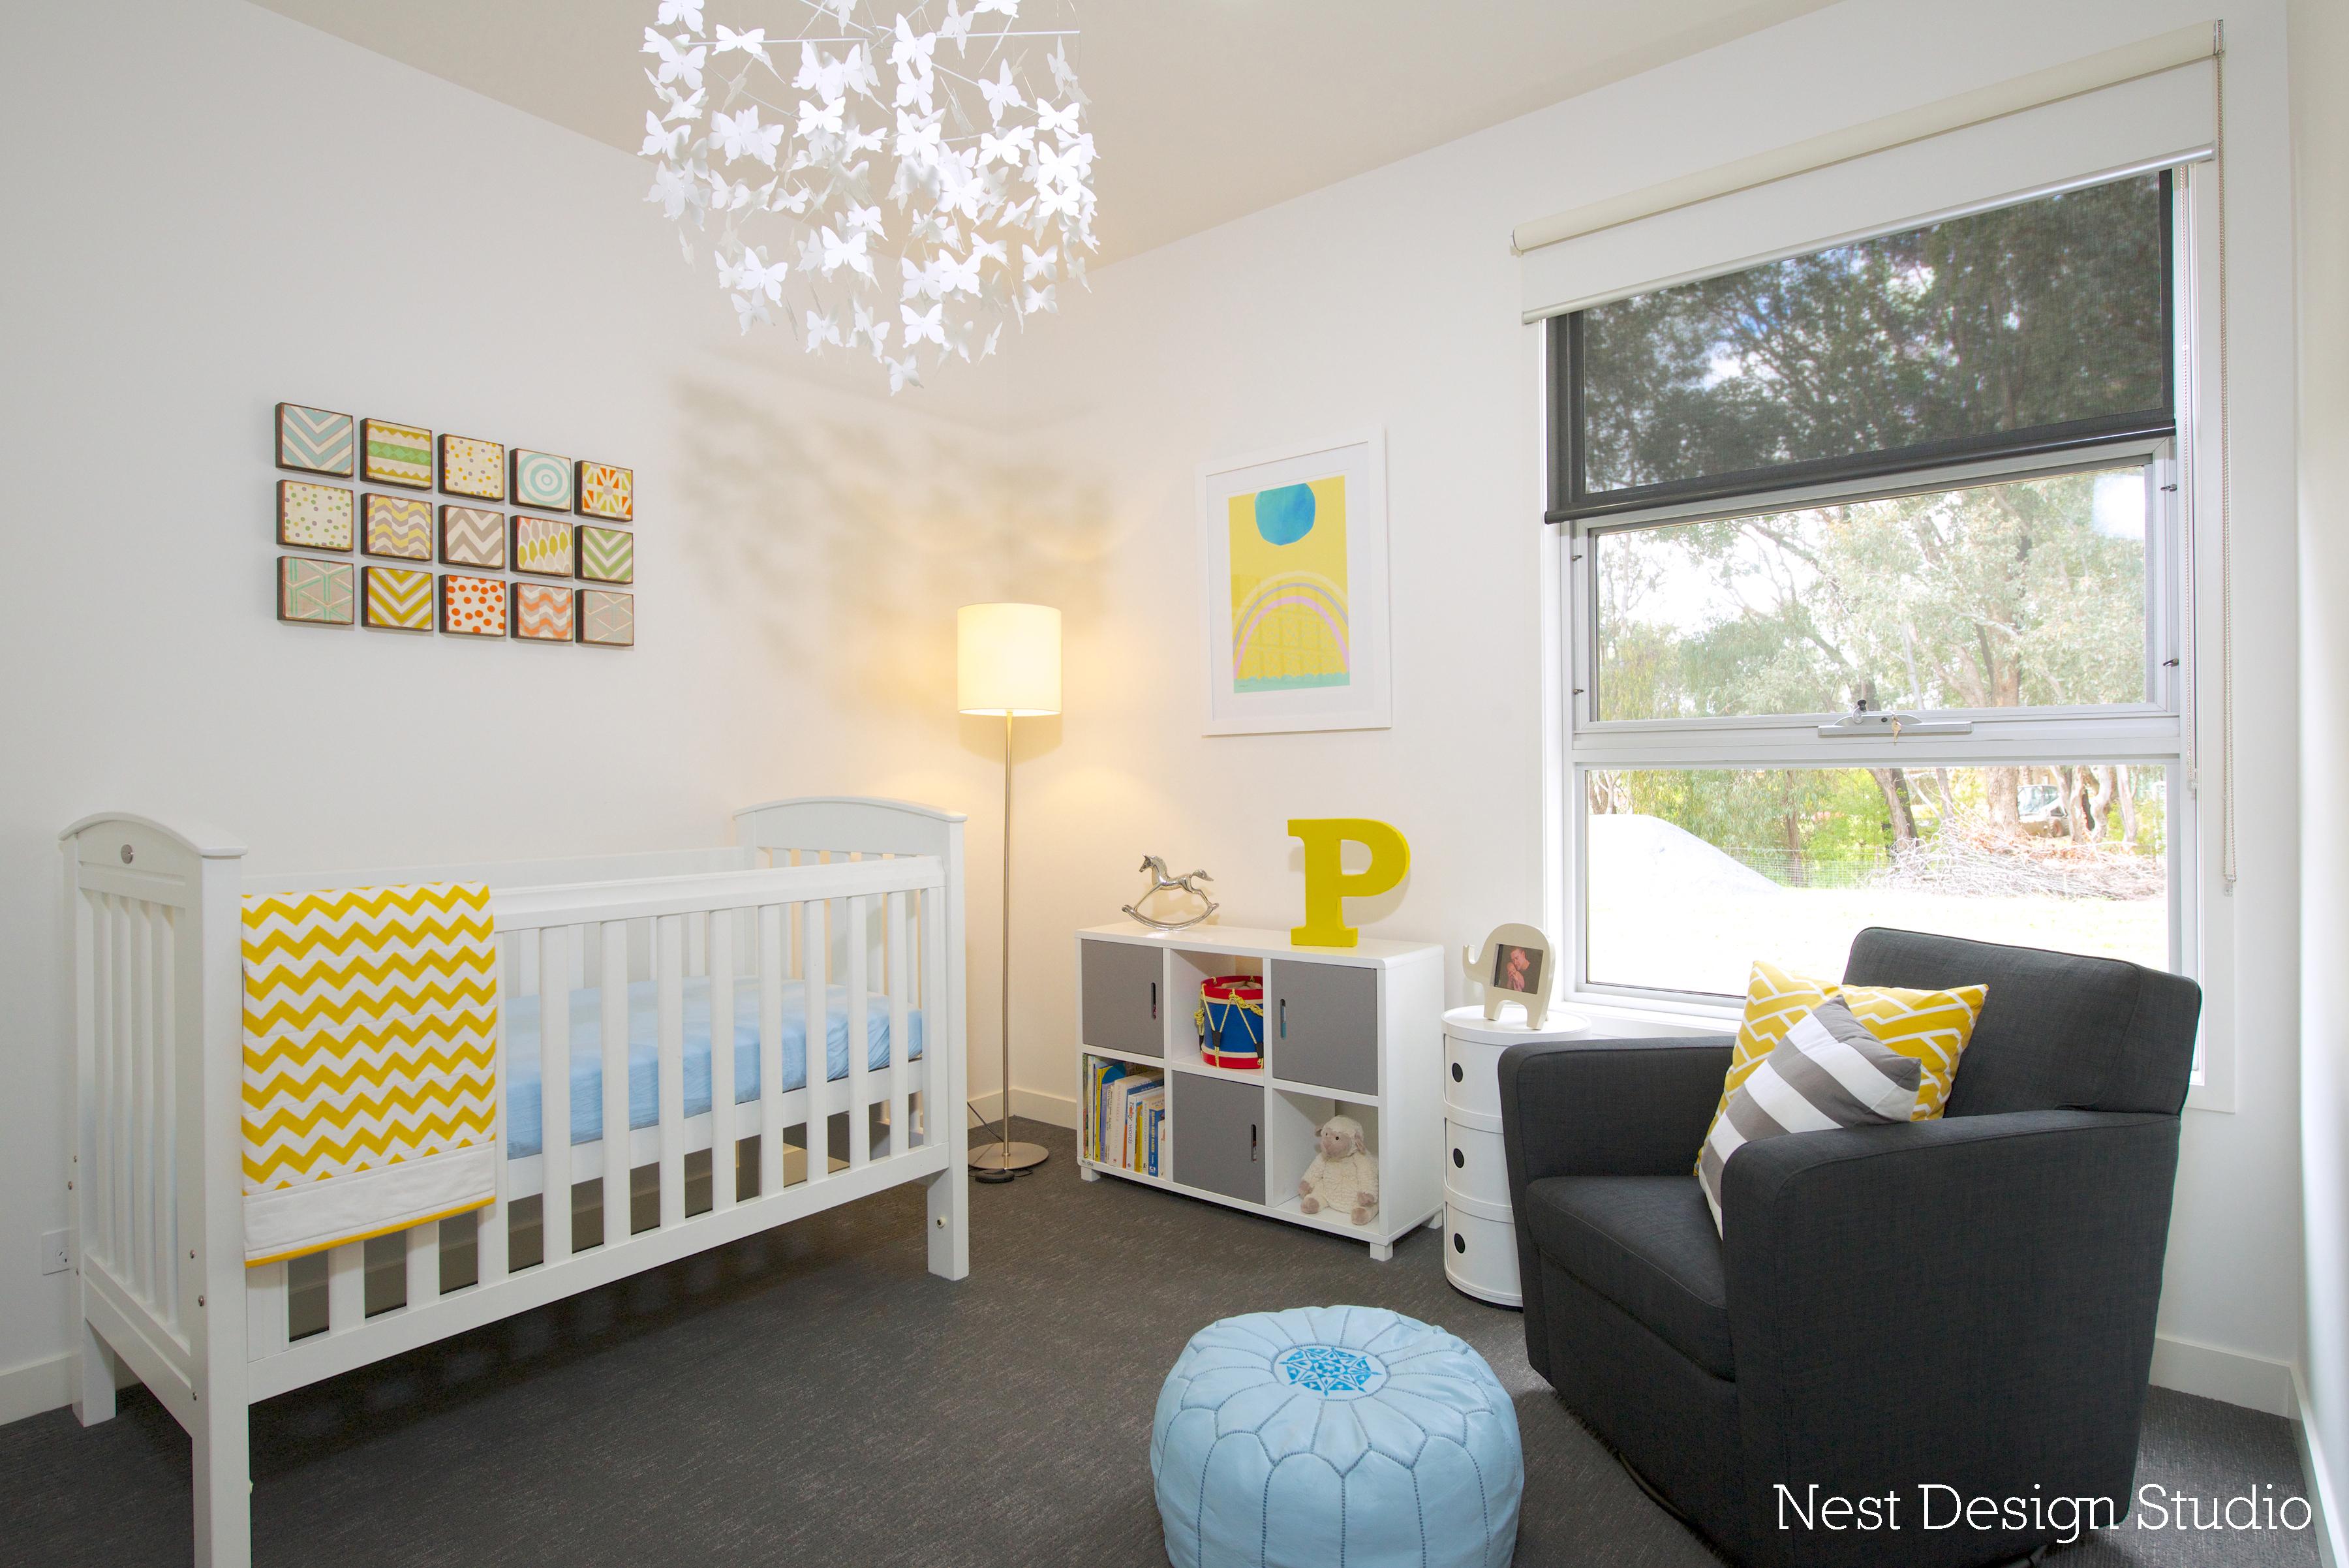 Boy Gray and Yellow Nursery Room View